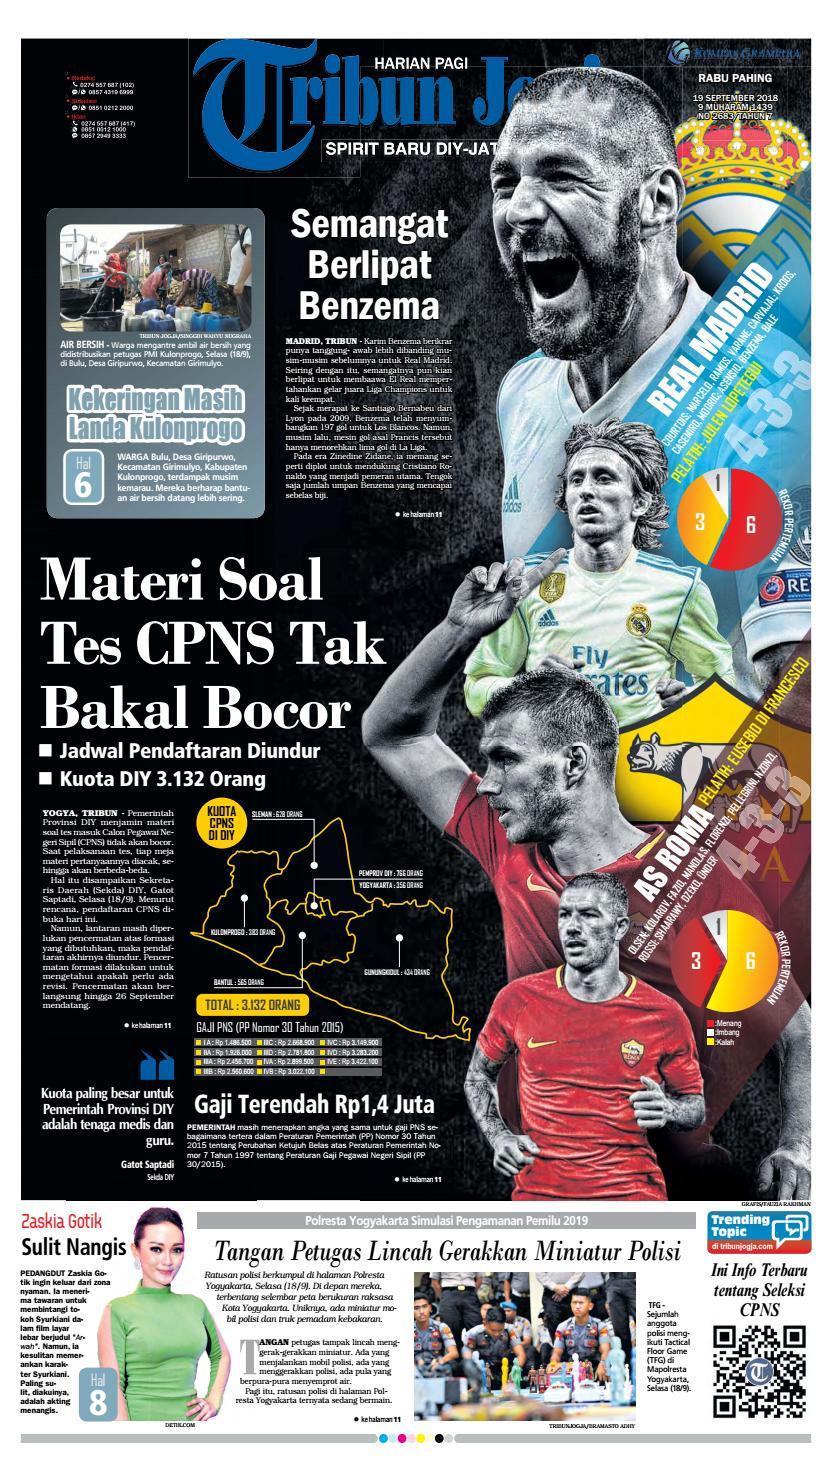 Tribun Jogja 19 09 2018 By Issuu Produk Ukm Bumn Kain Batik Middle Premium 3 Bendera 01